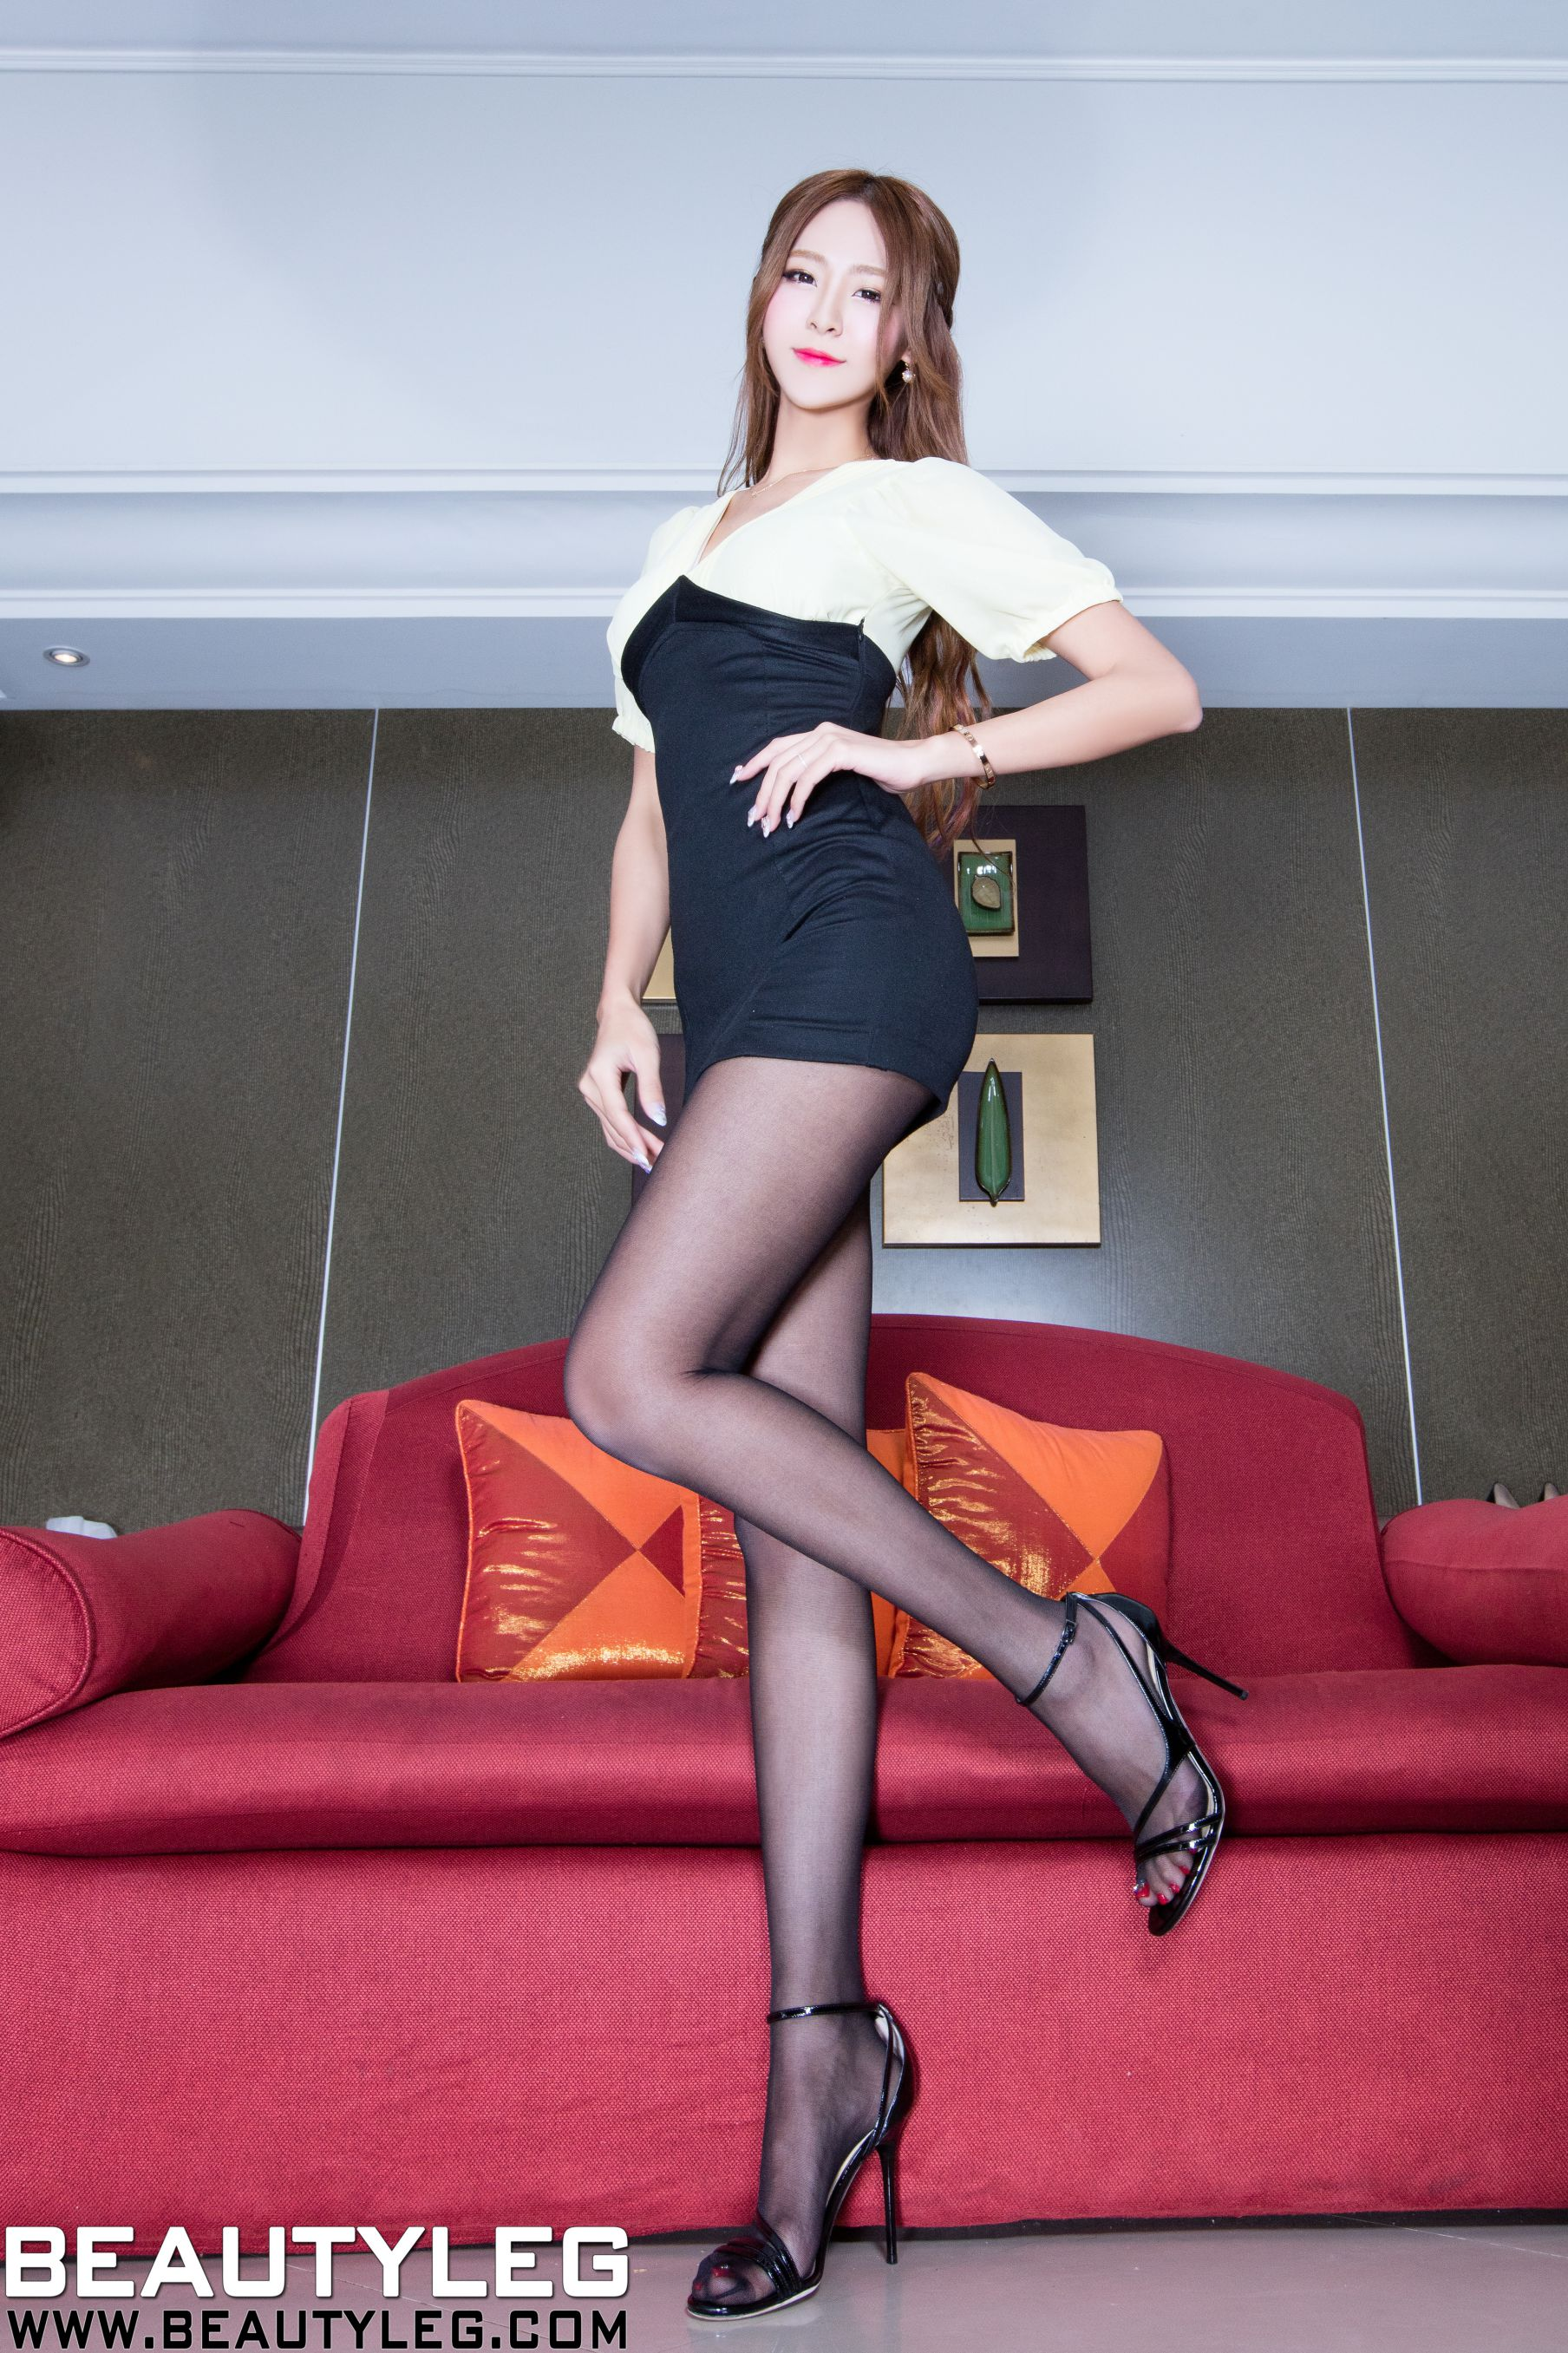 VOL.1909 [Beautyleg]长腿美女:Winnie小雪(庄咏惠,庄温妮,腿模Winnie)高品质写真套图(46P)